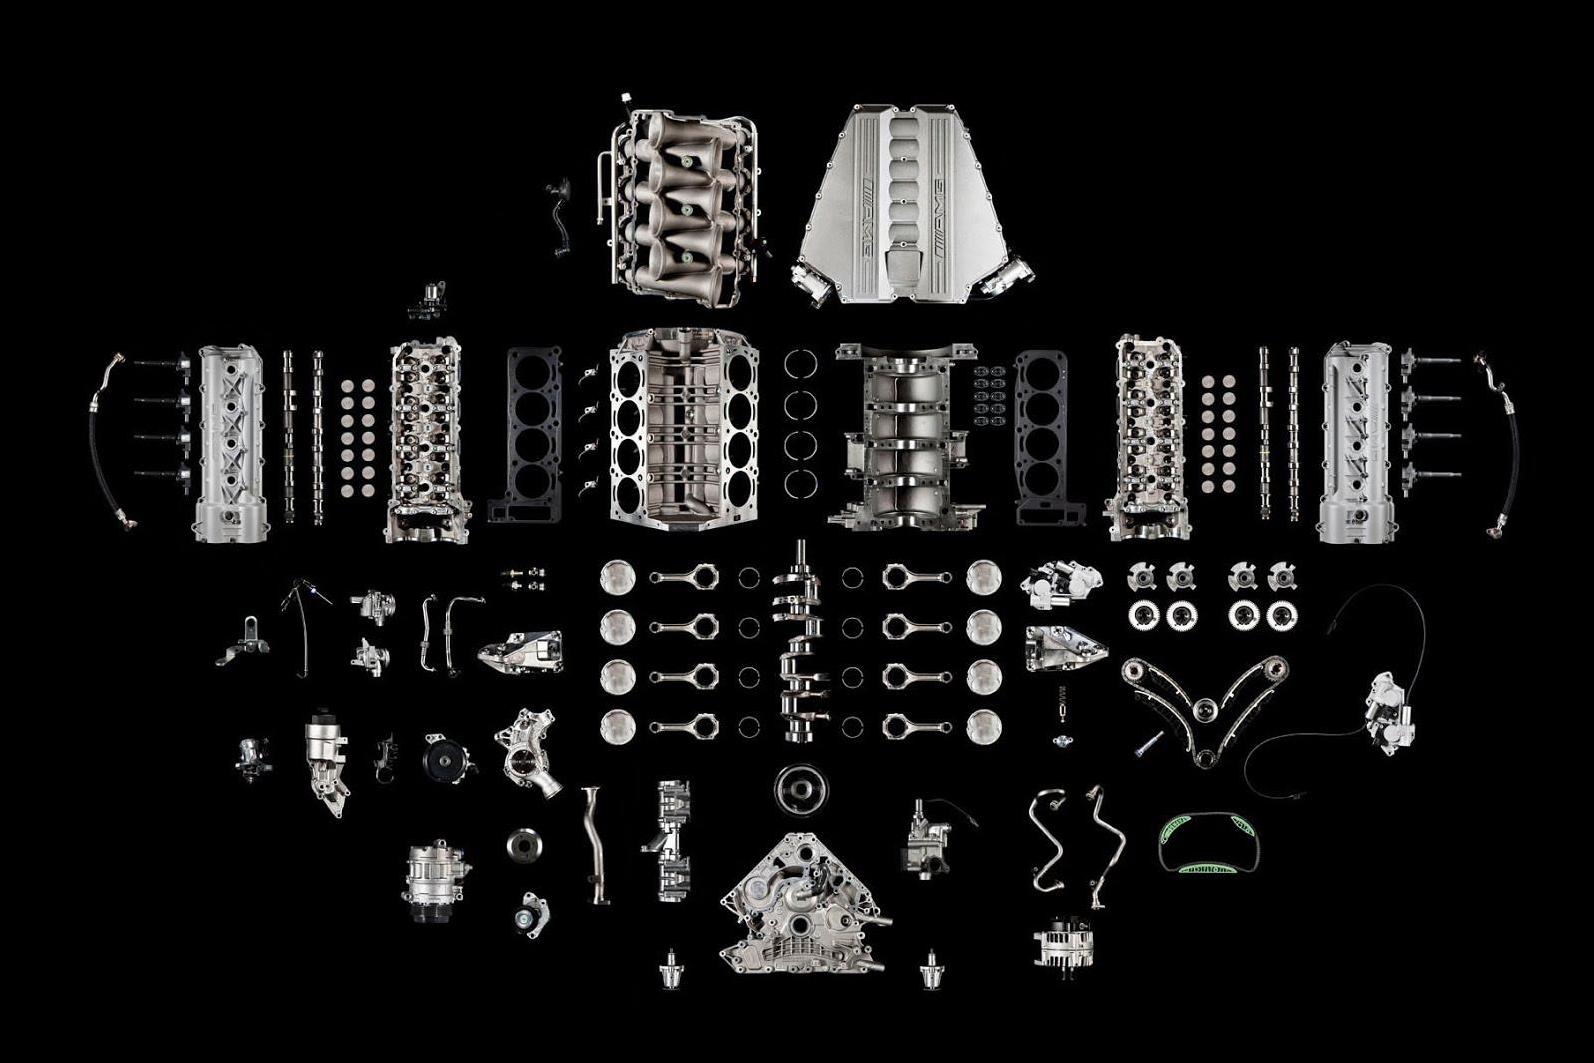 Car parts oscaro.com | Auto mechanics | Pinterest | Cars